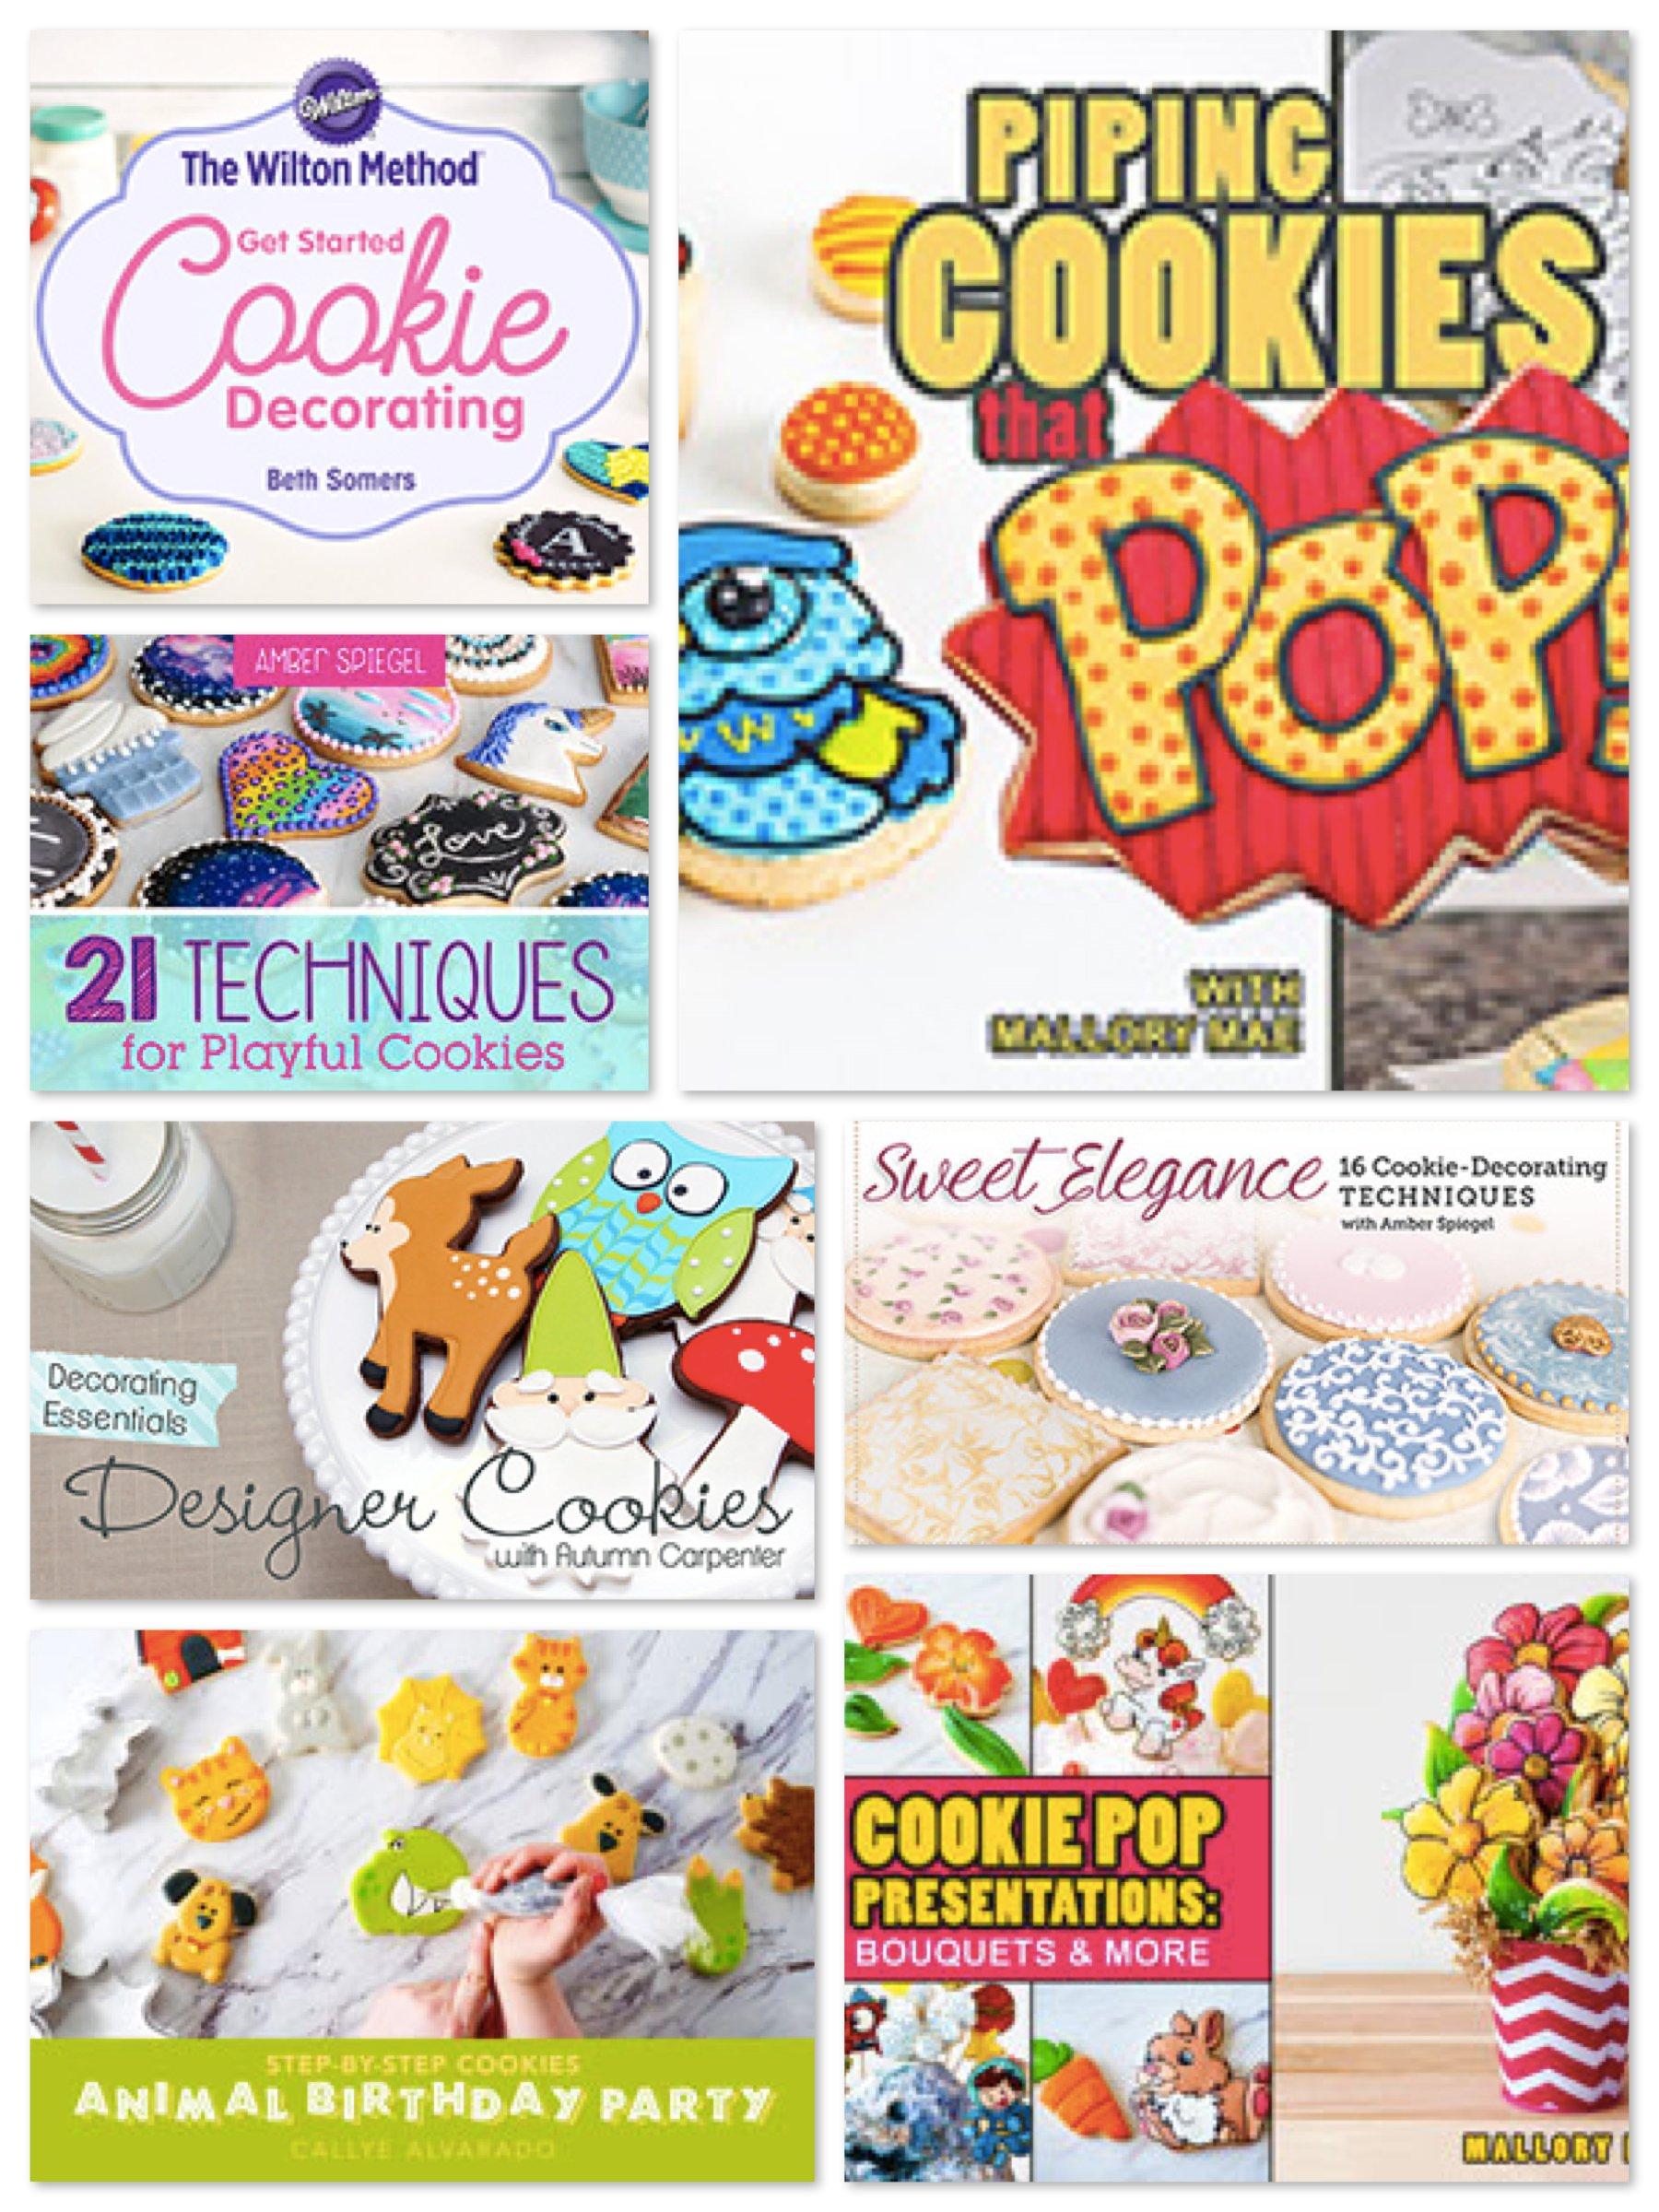 Online Cookie Decorating Classes